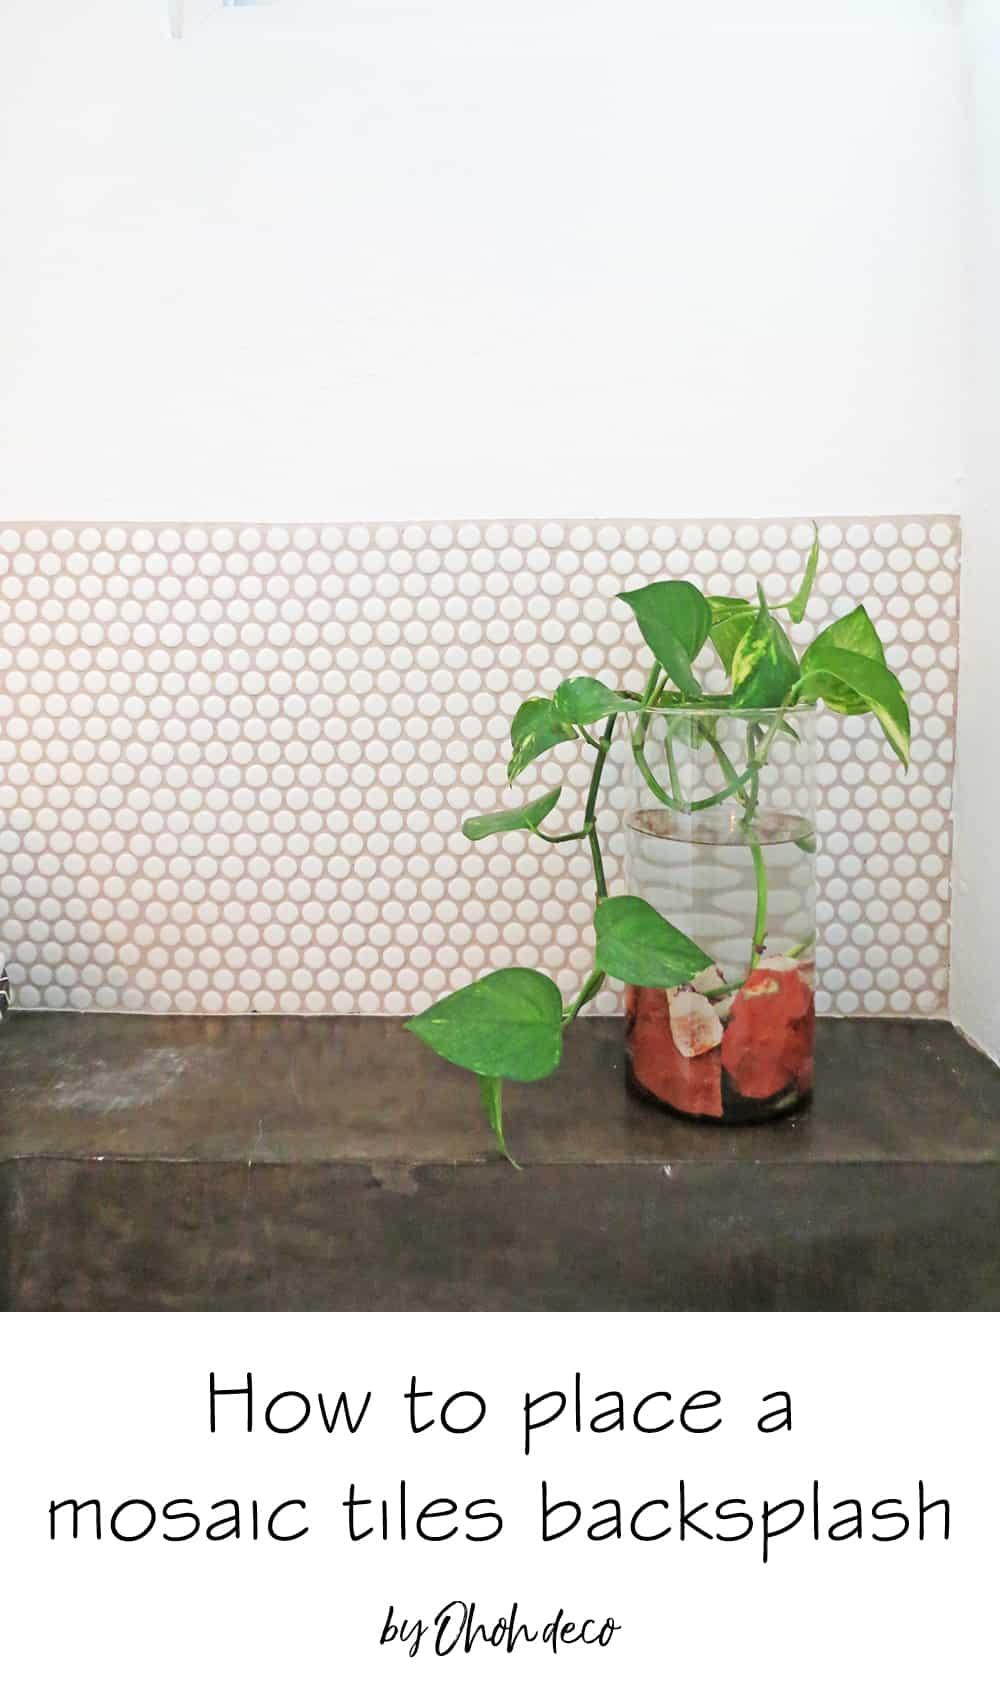 How to place a mosaic tiles backsplash #pennytiles #backsplash #bathroom #mosaic